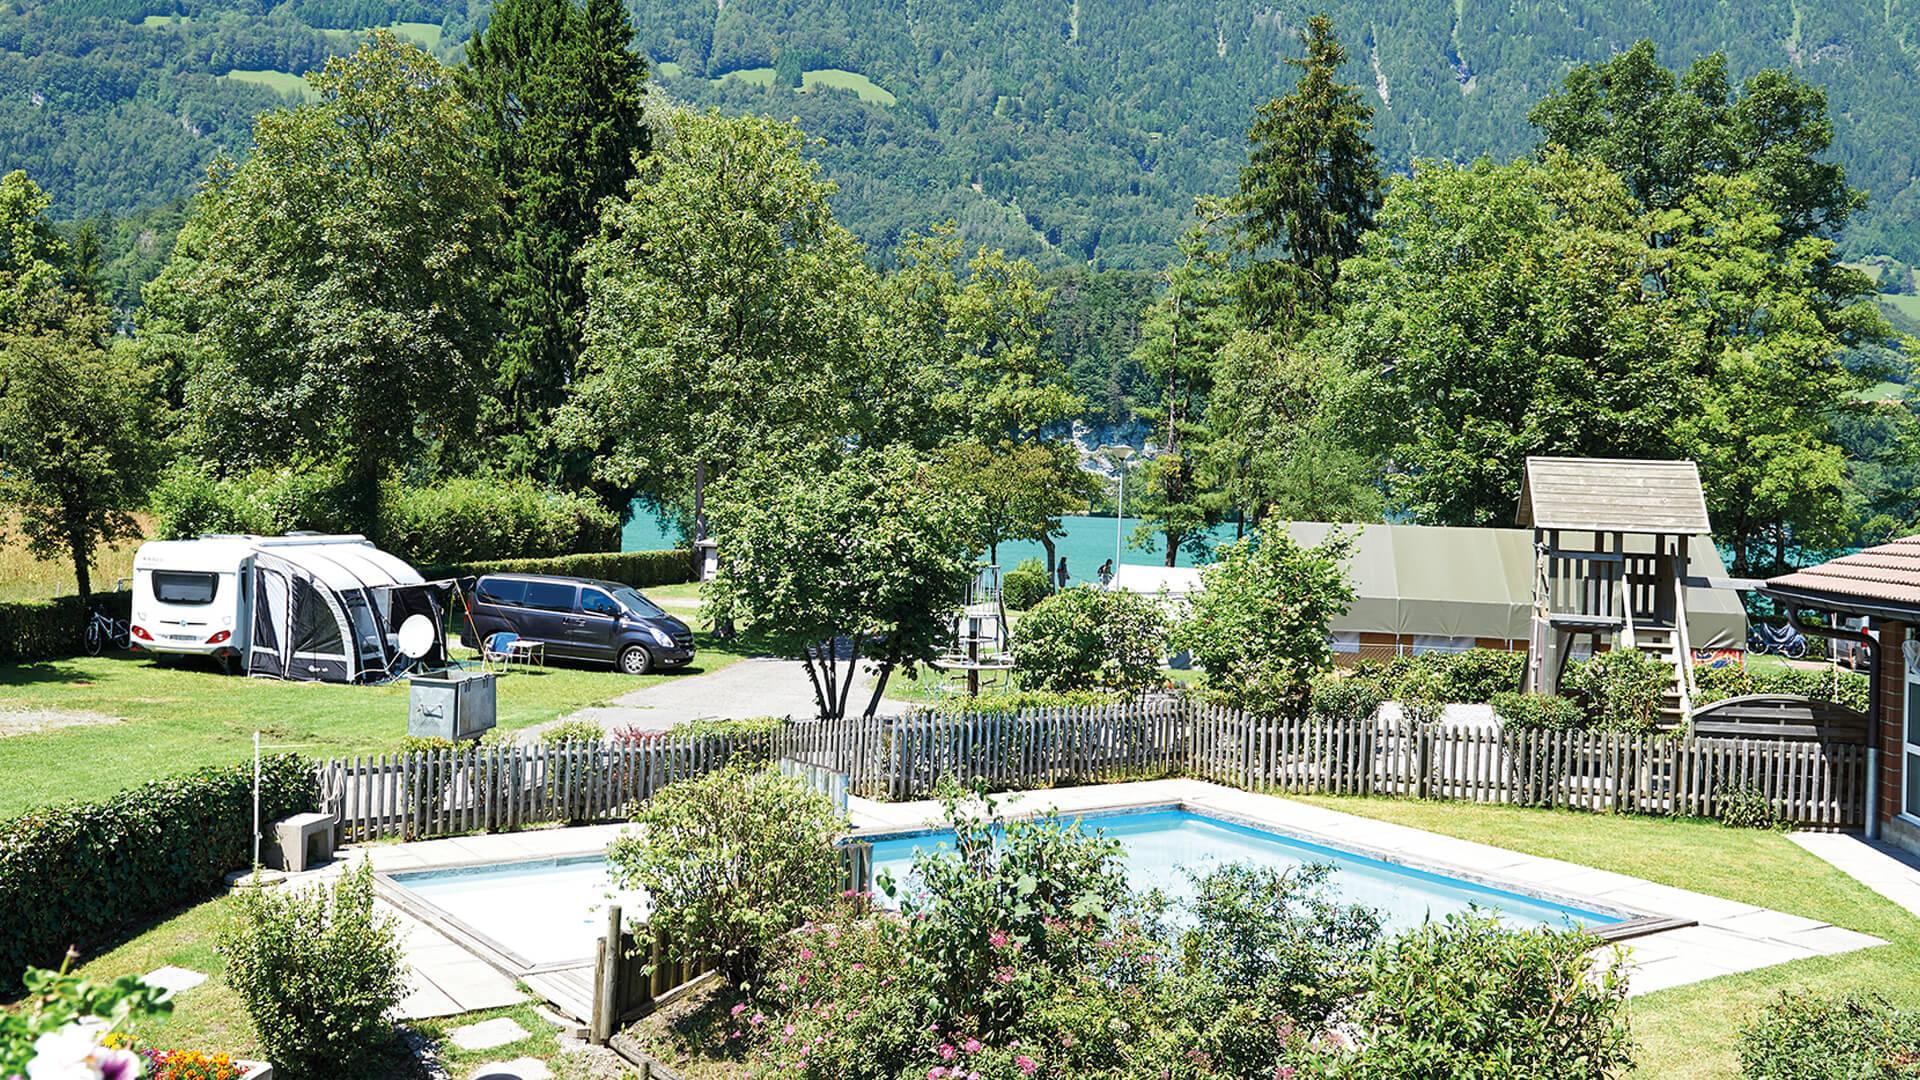 tcs-camping-pool